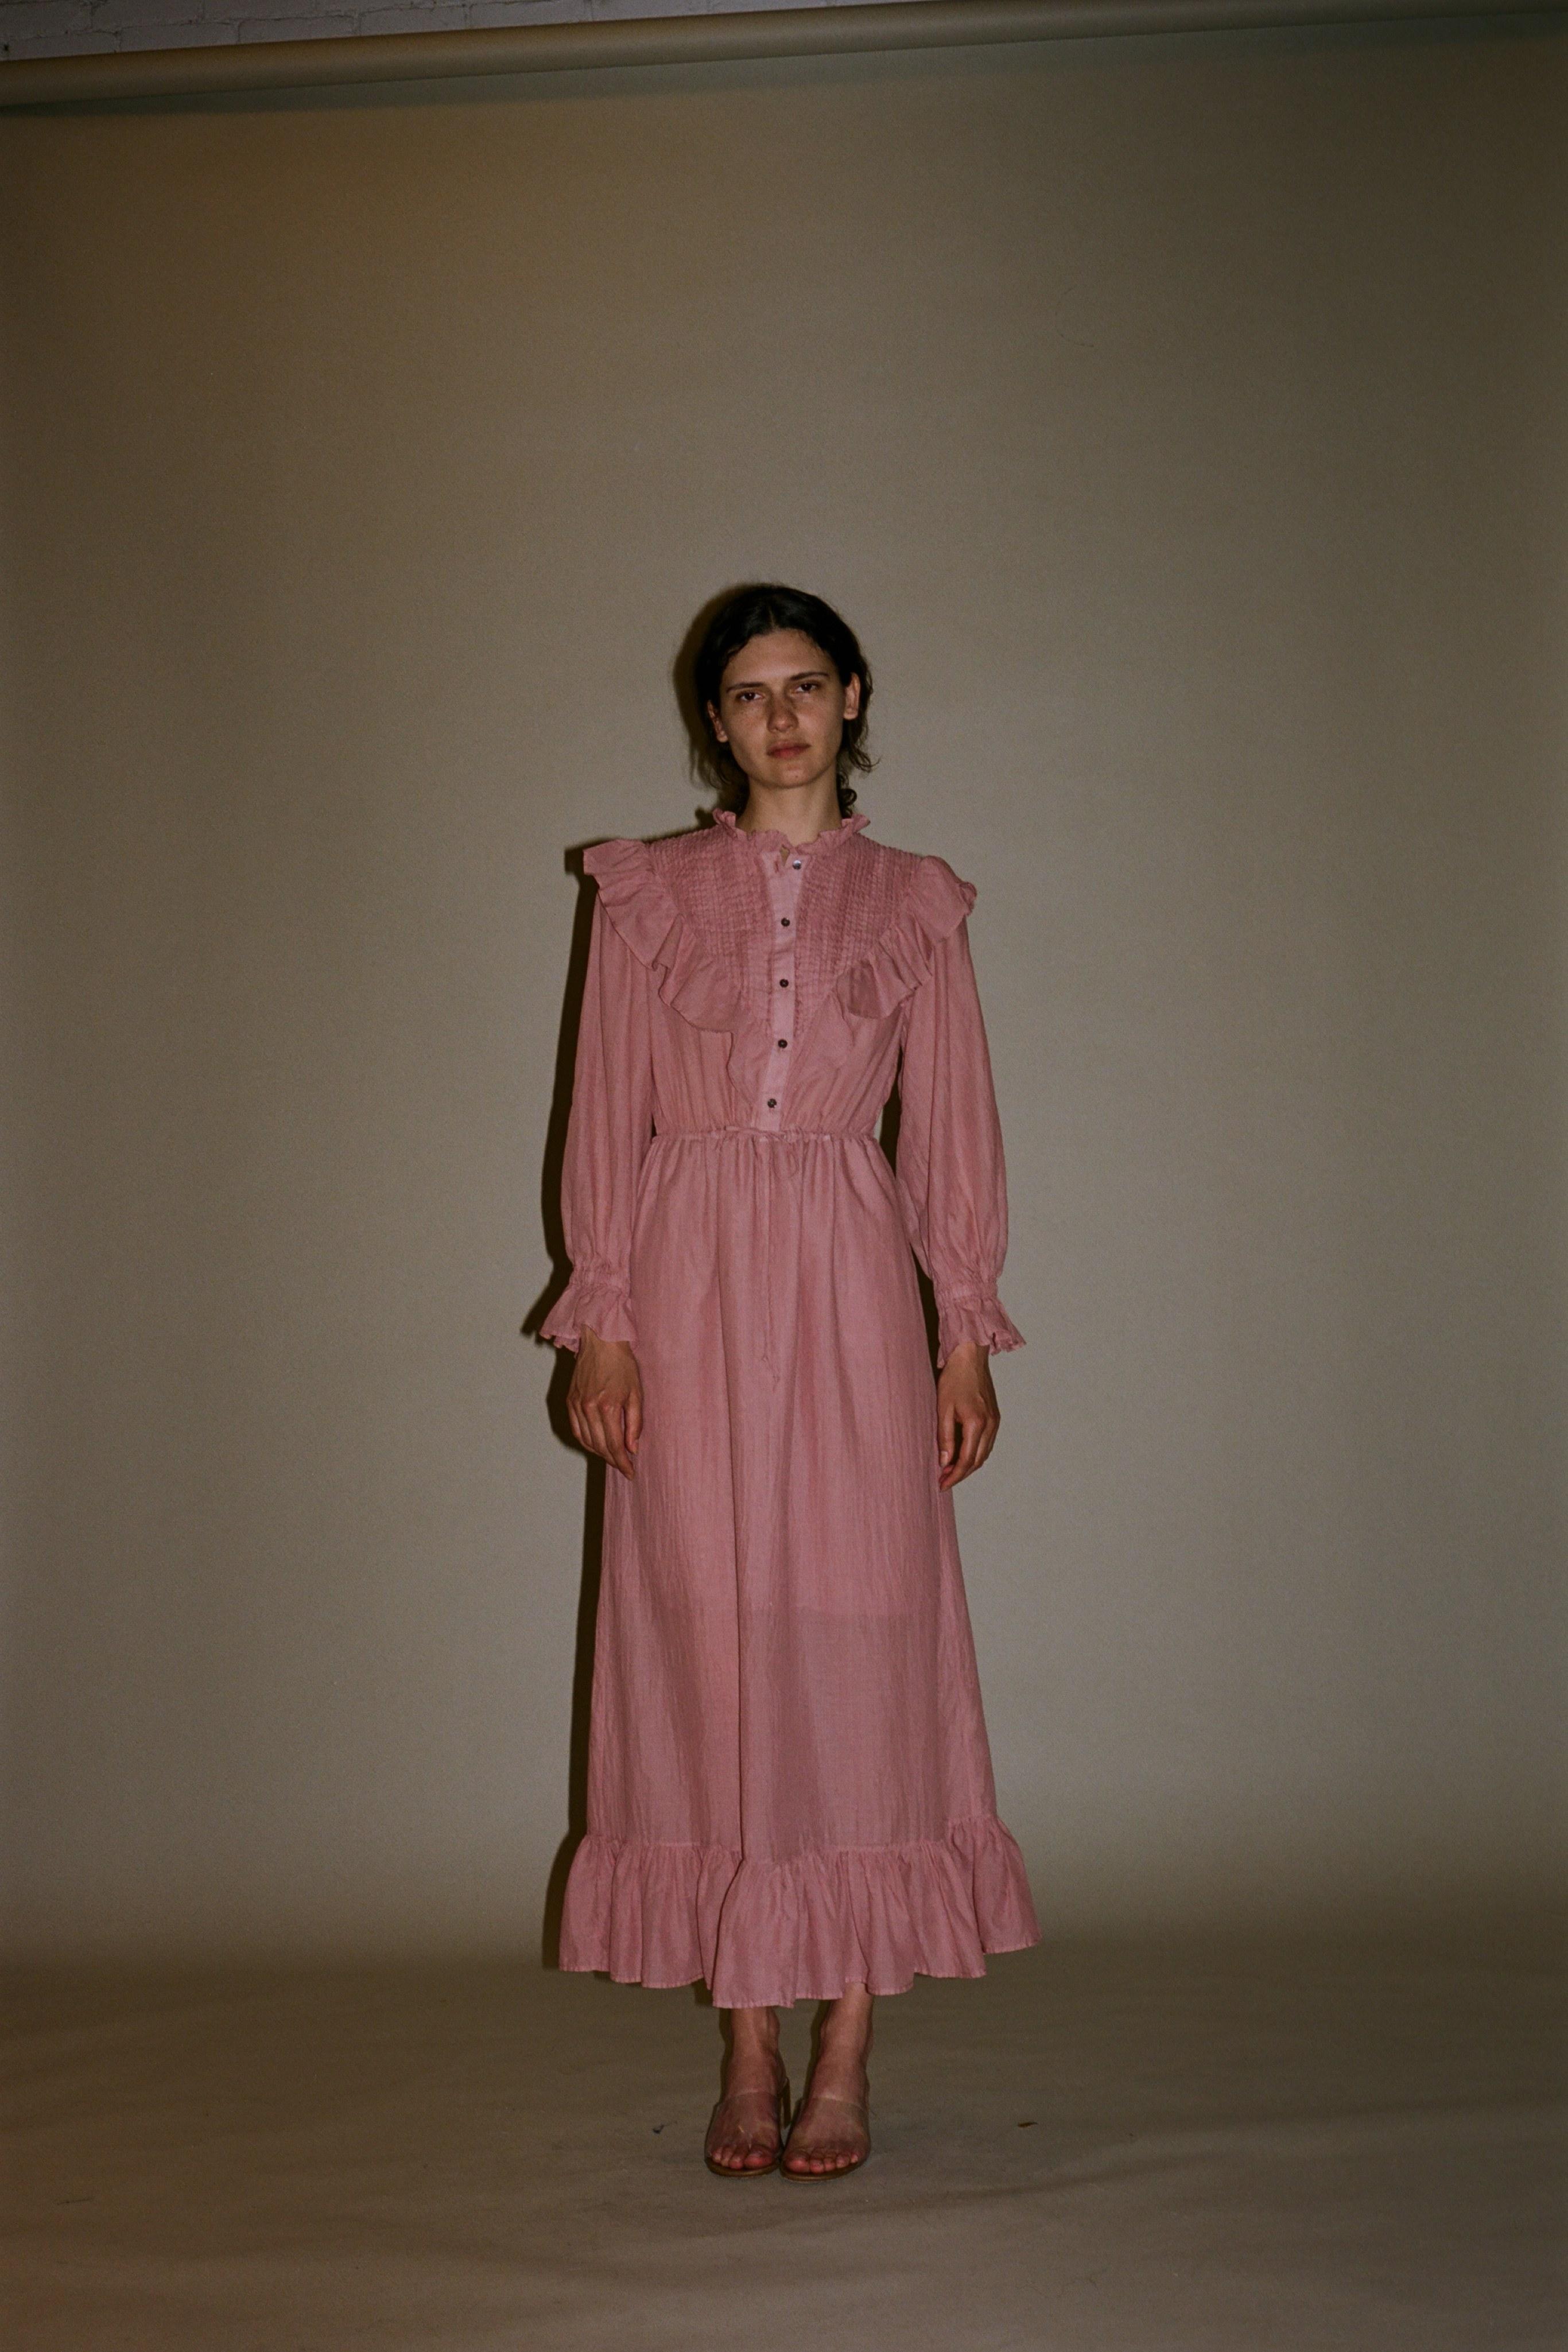 Clara Cotton Ruffle Dress